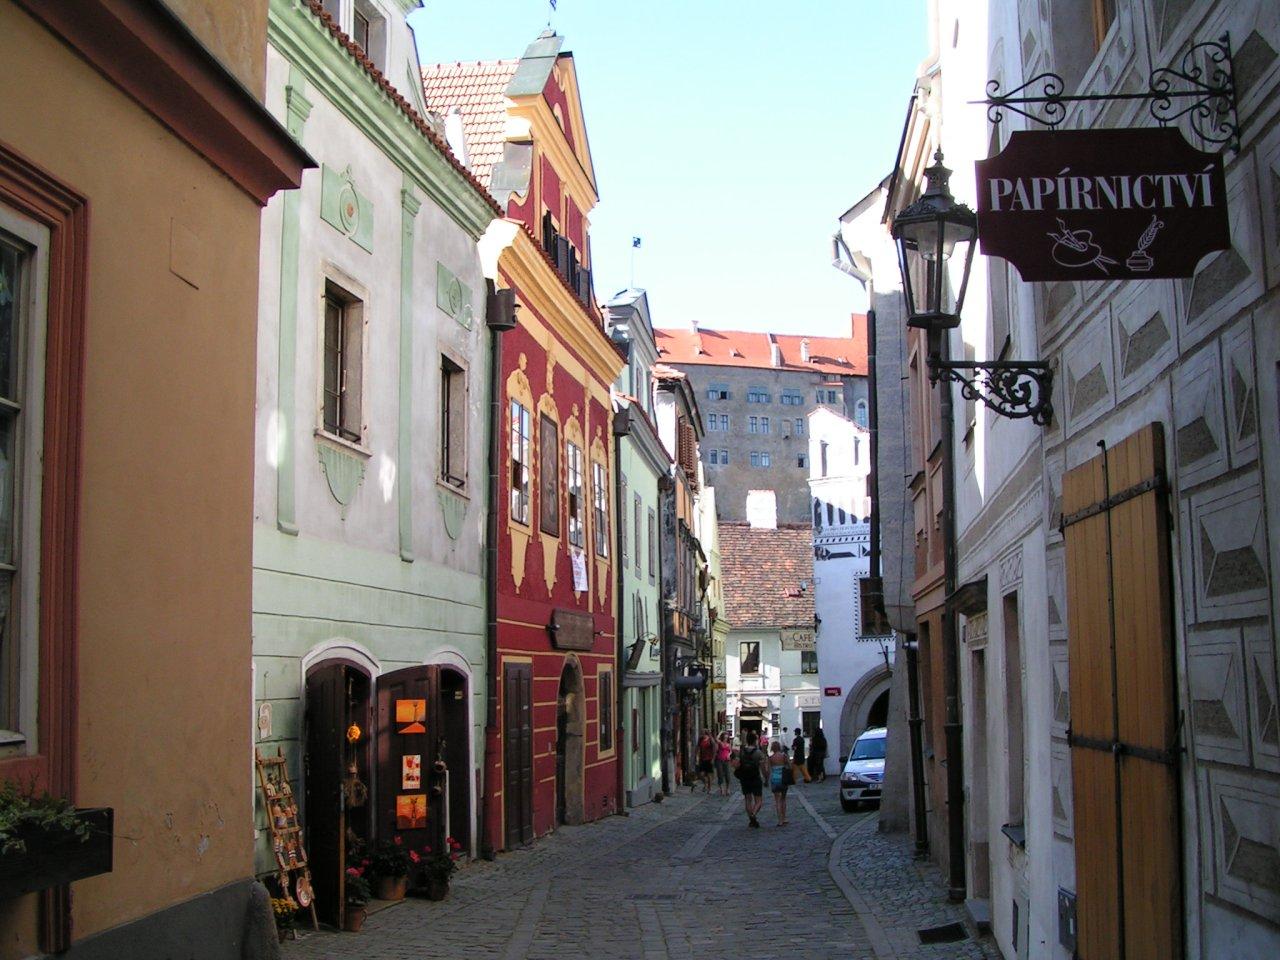 Streets of the old city, Cesky Krumlov, Czech Republic